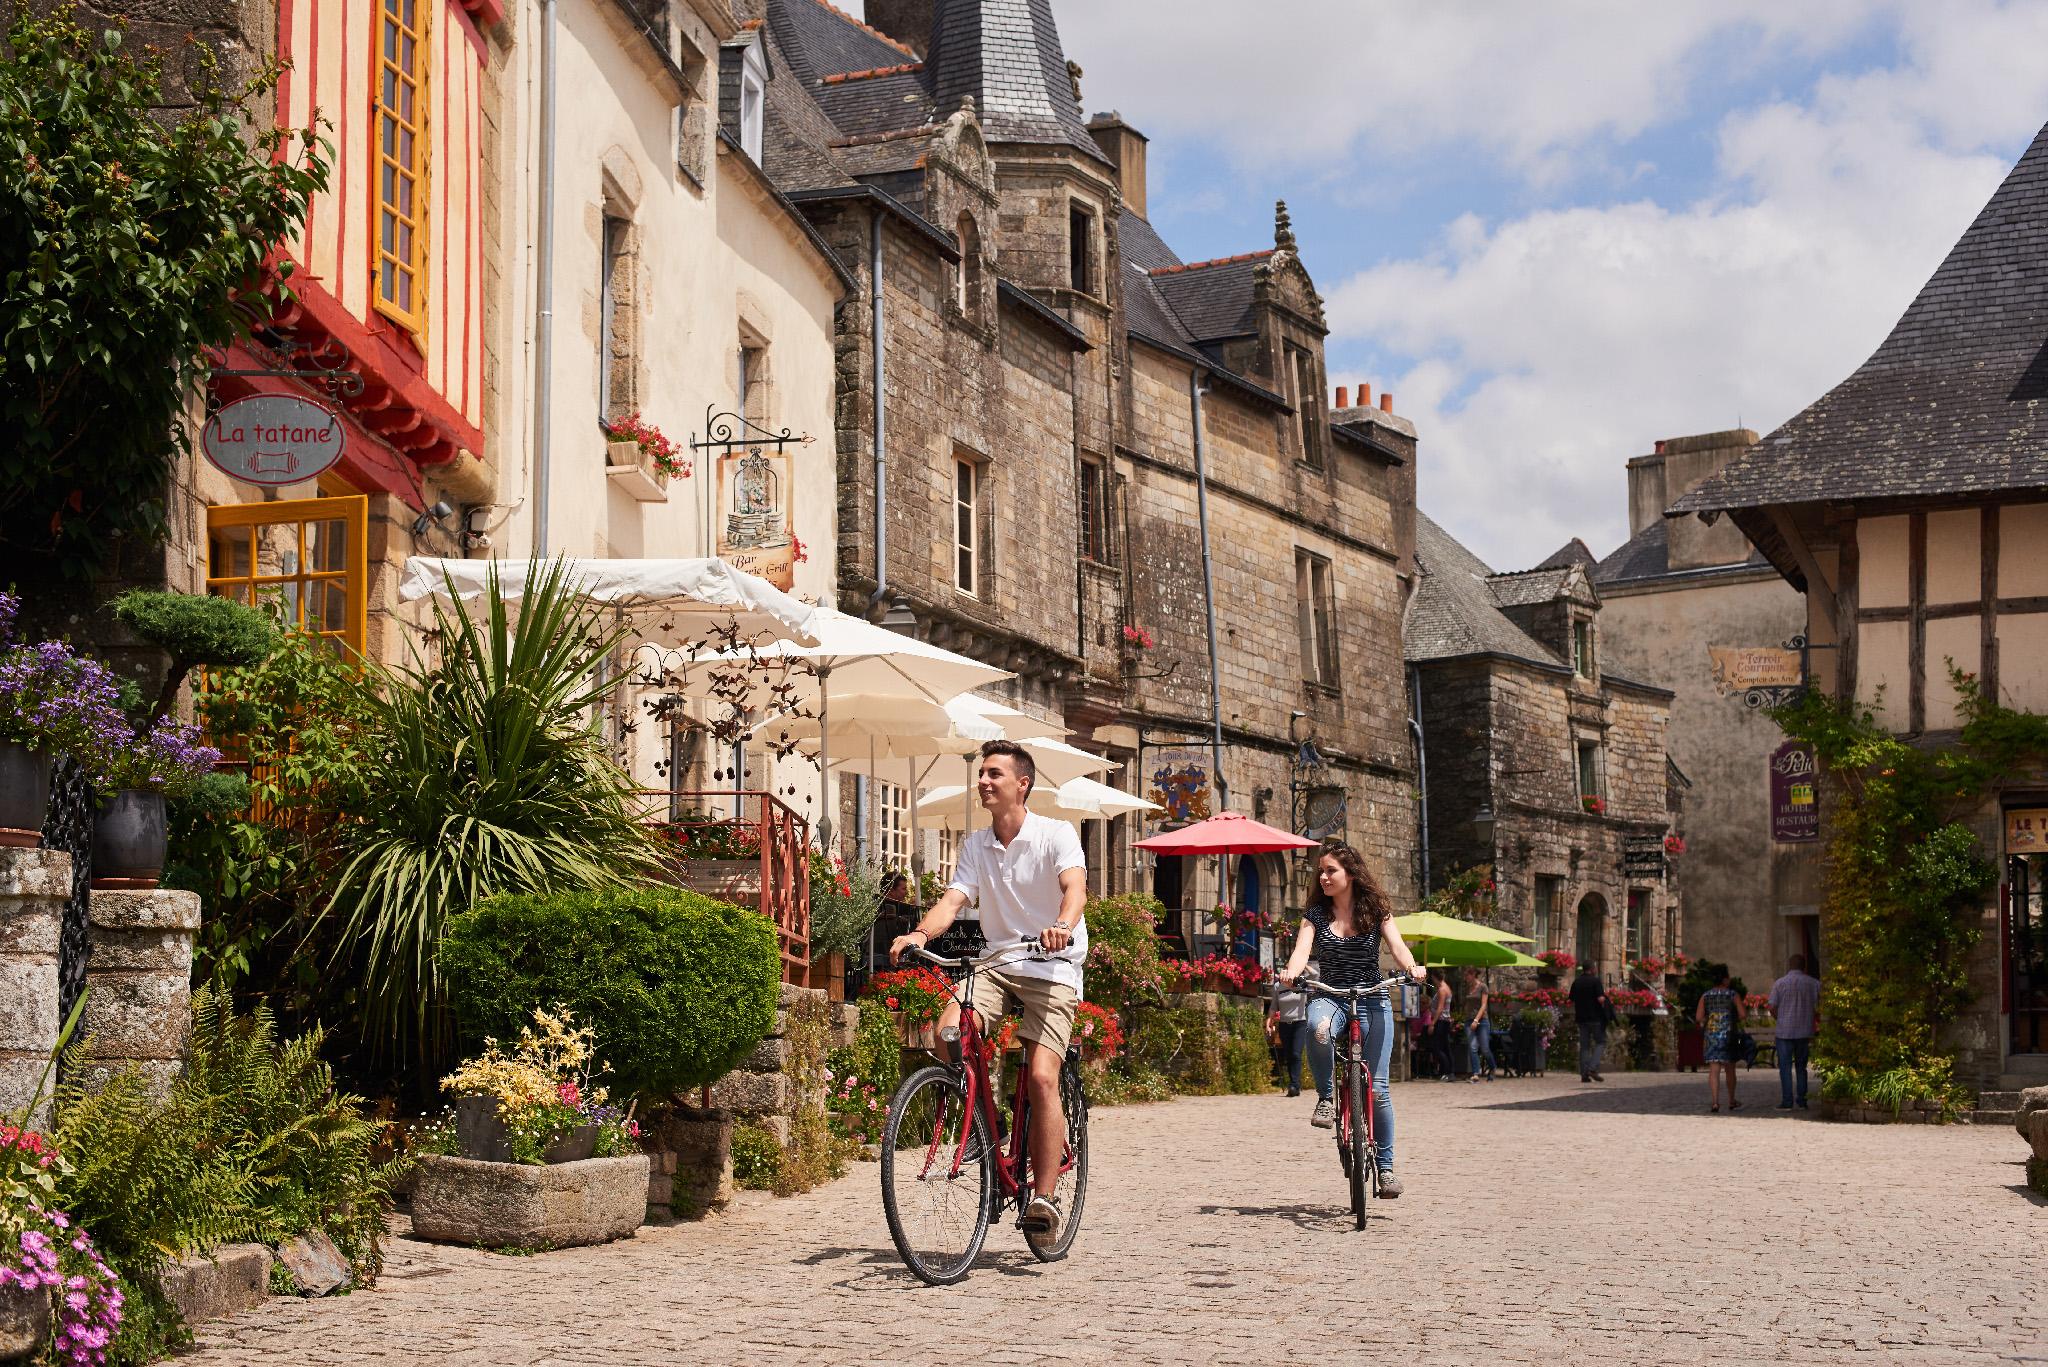 78_photographie_tourisme_patrimoine_paysage_voyage_nantes